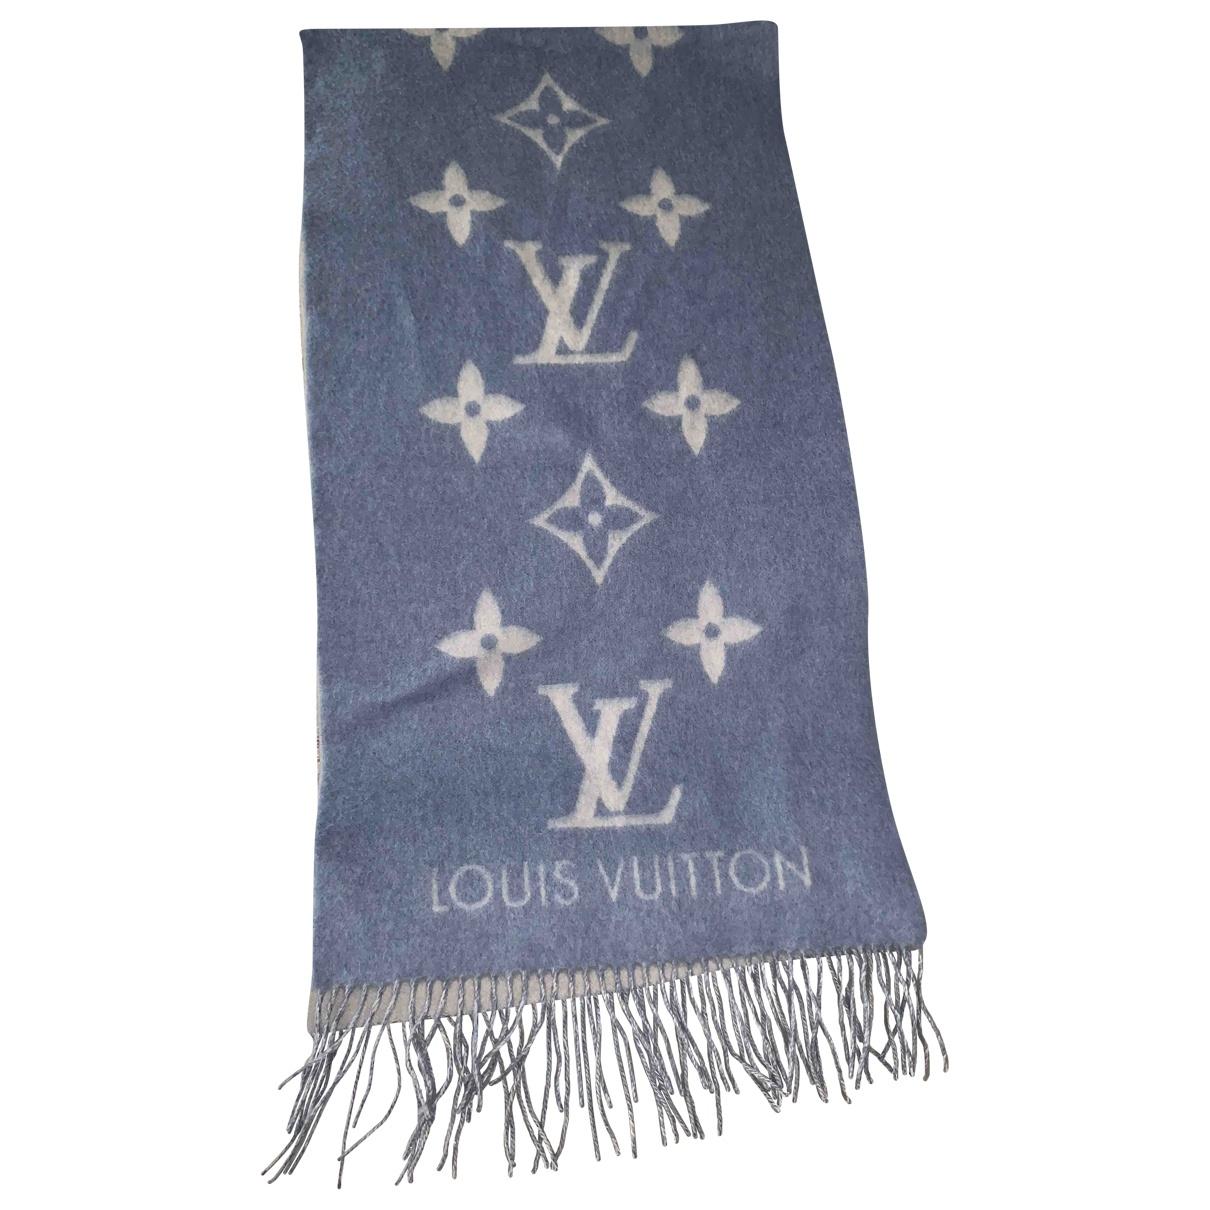 Louis Vuitton \N Schal in  Blau Kaschmir